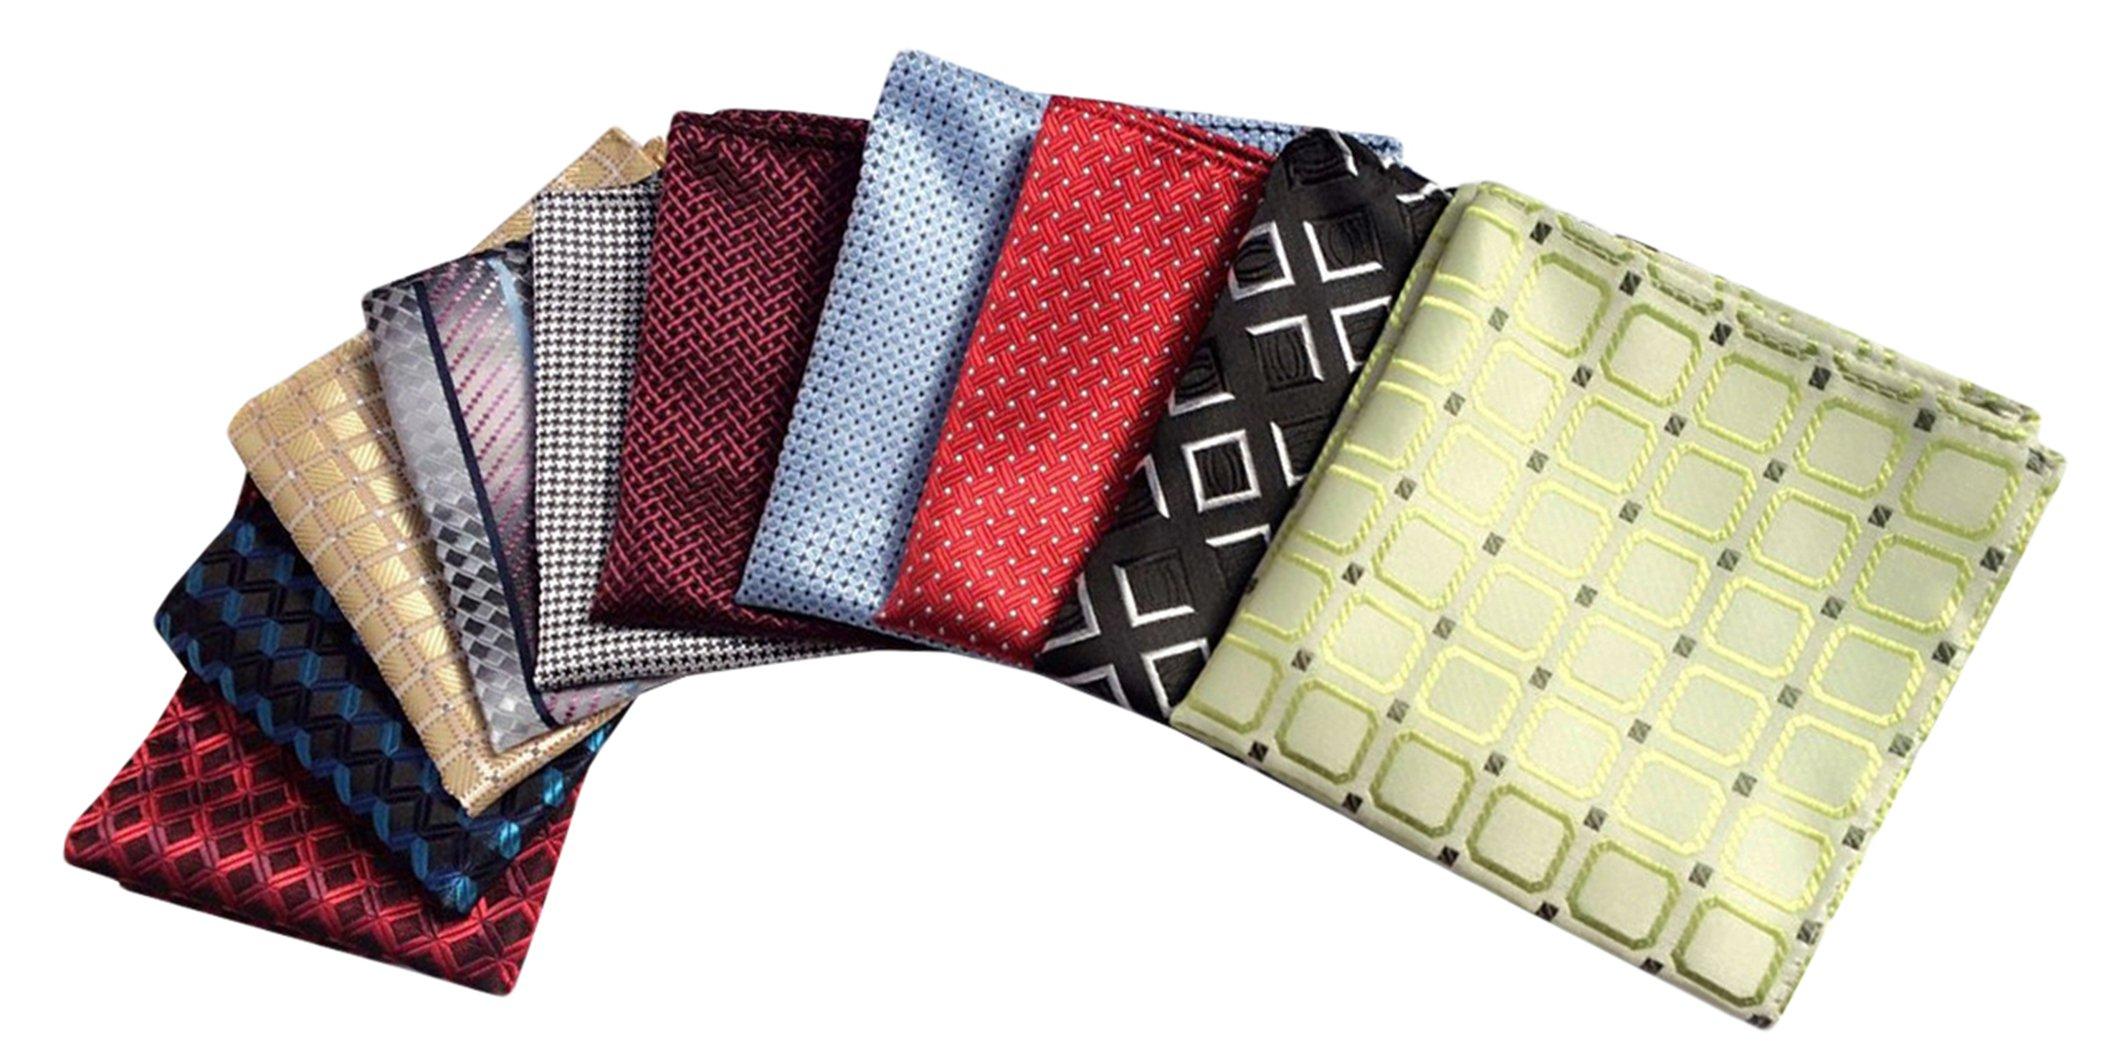 MENDENG Men's 10 Pack Plaid Check Assorted Pocket Square Silk Handkerchief Set